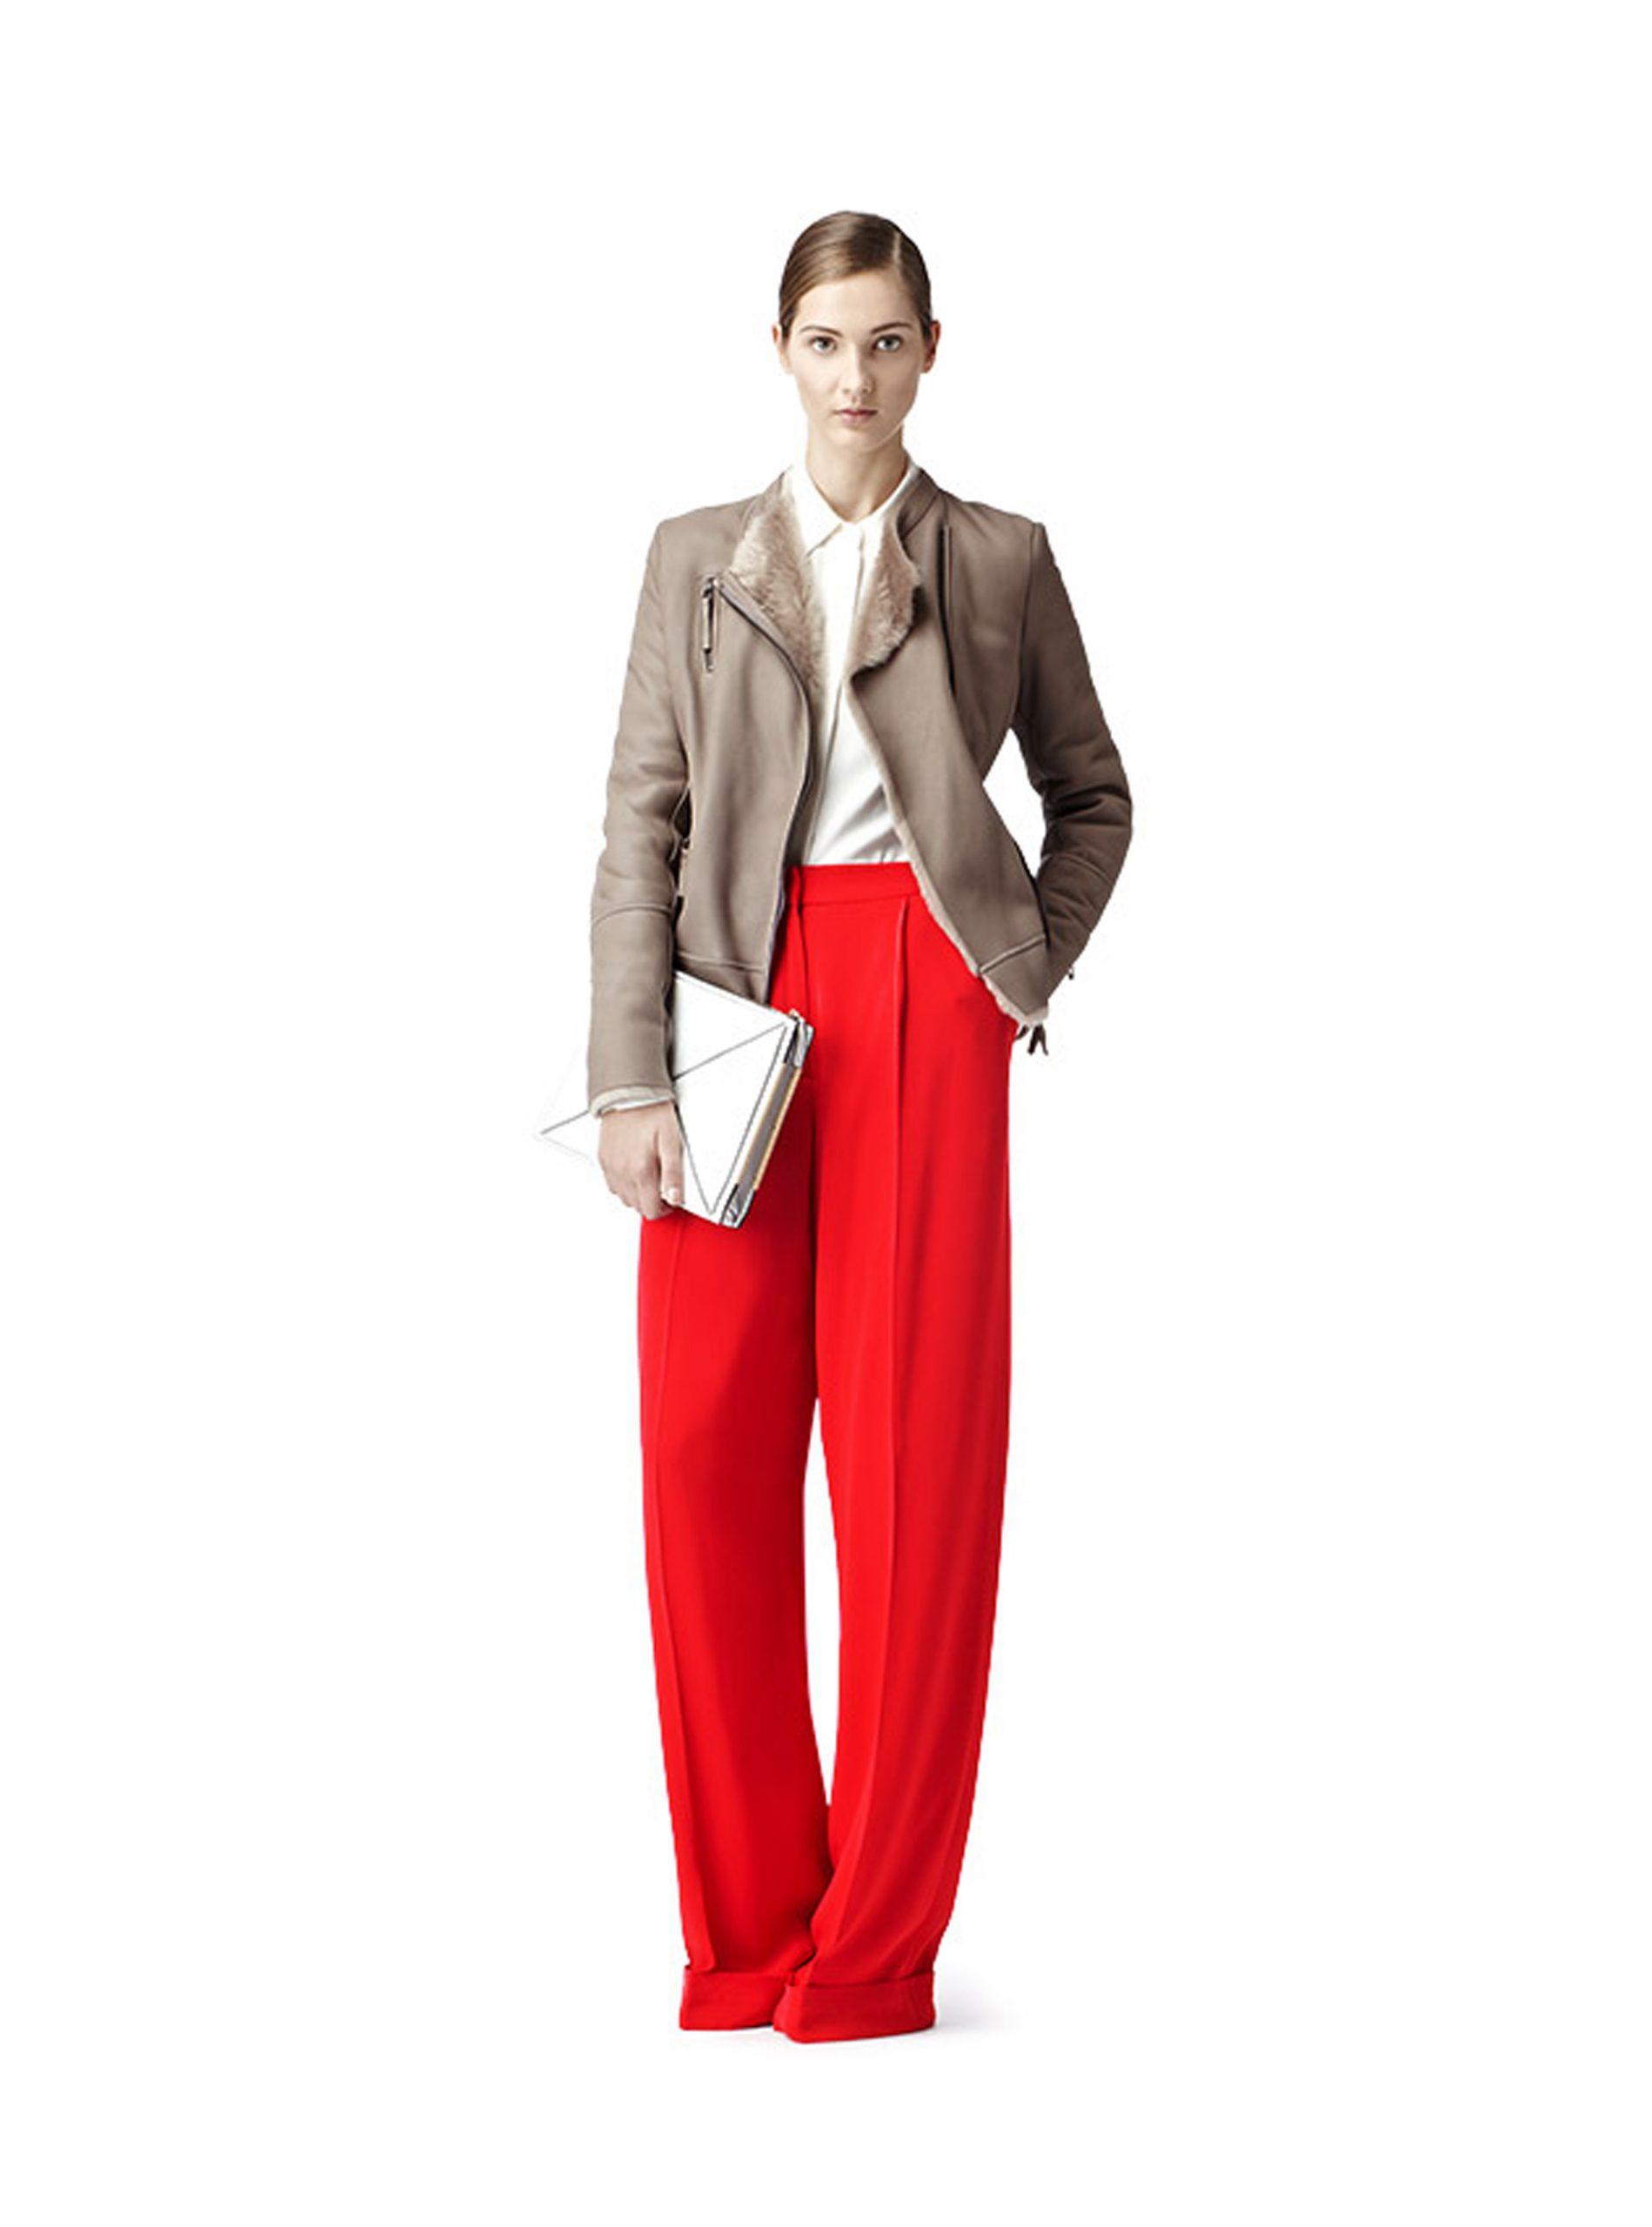 Reiss Jacs Stone model Sheepskin Fashion Buys